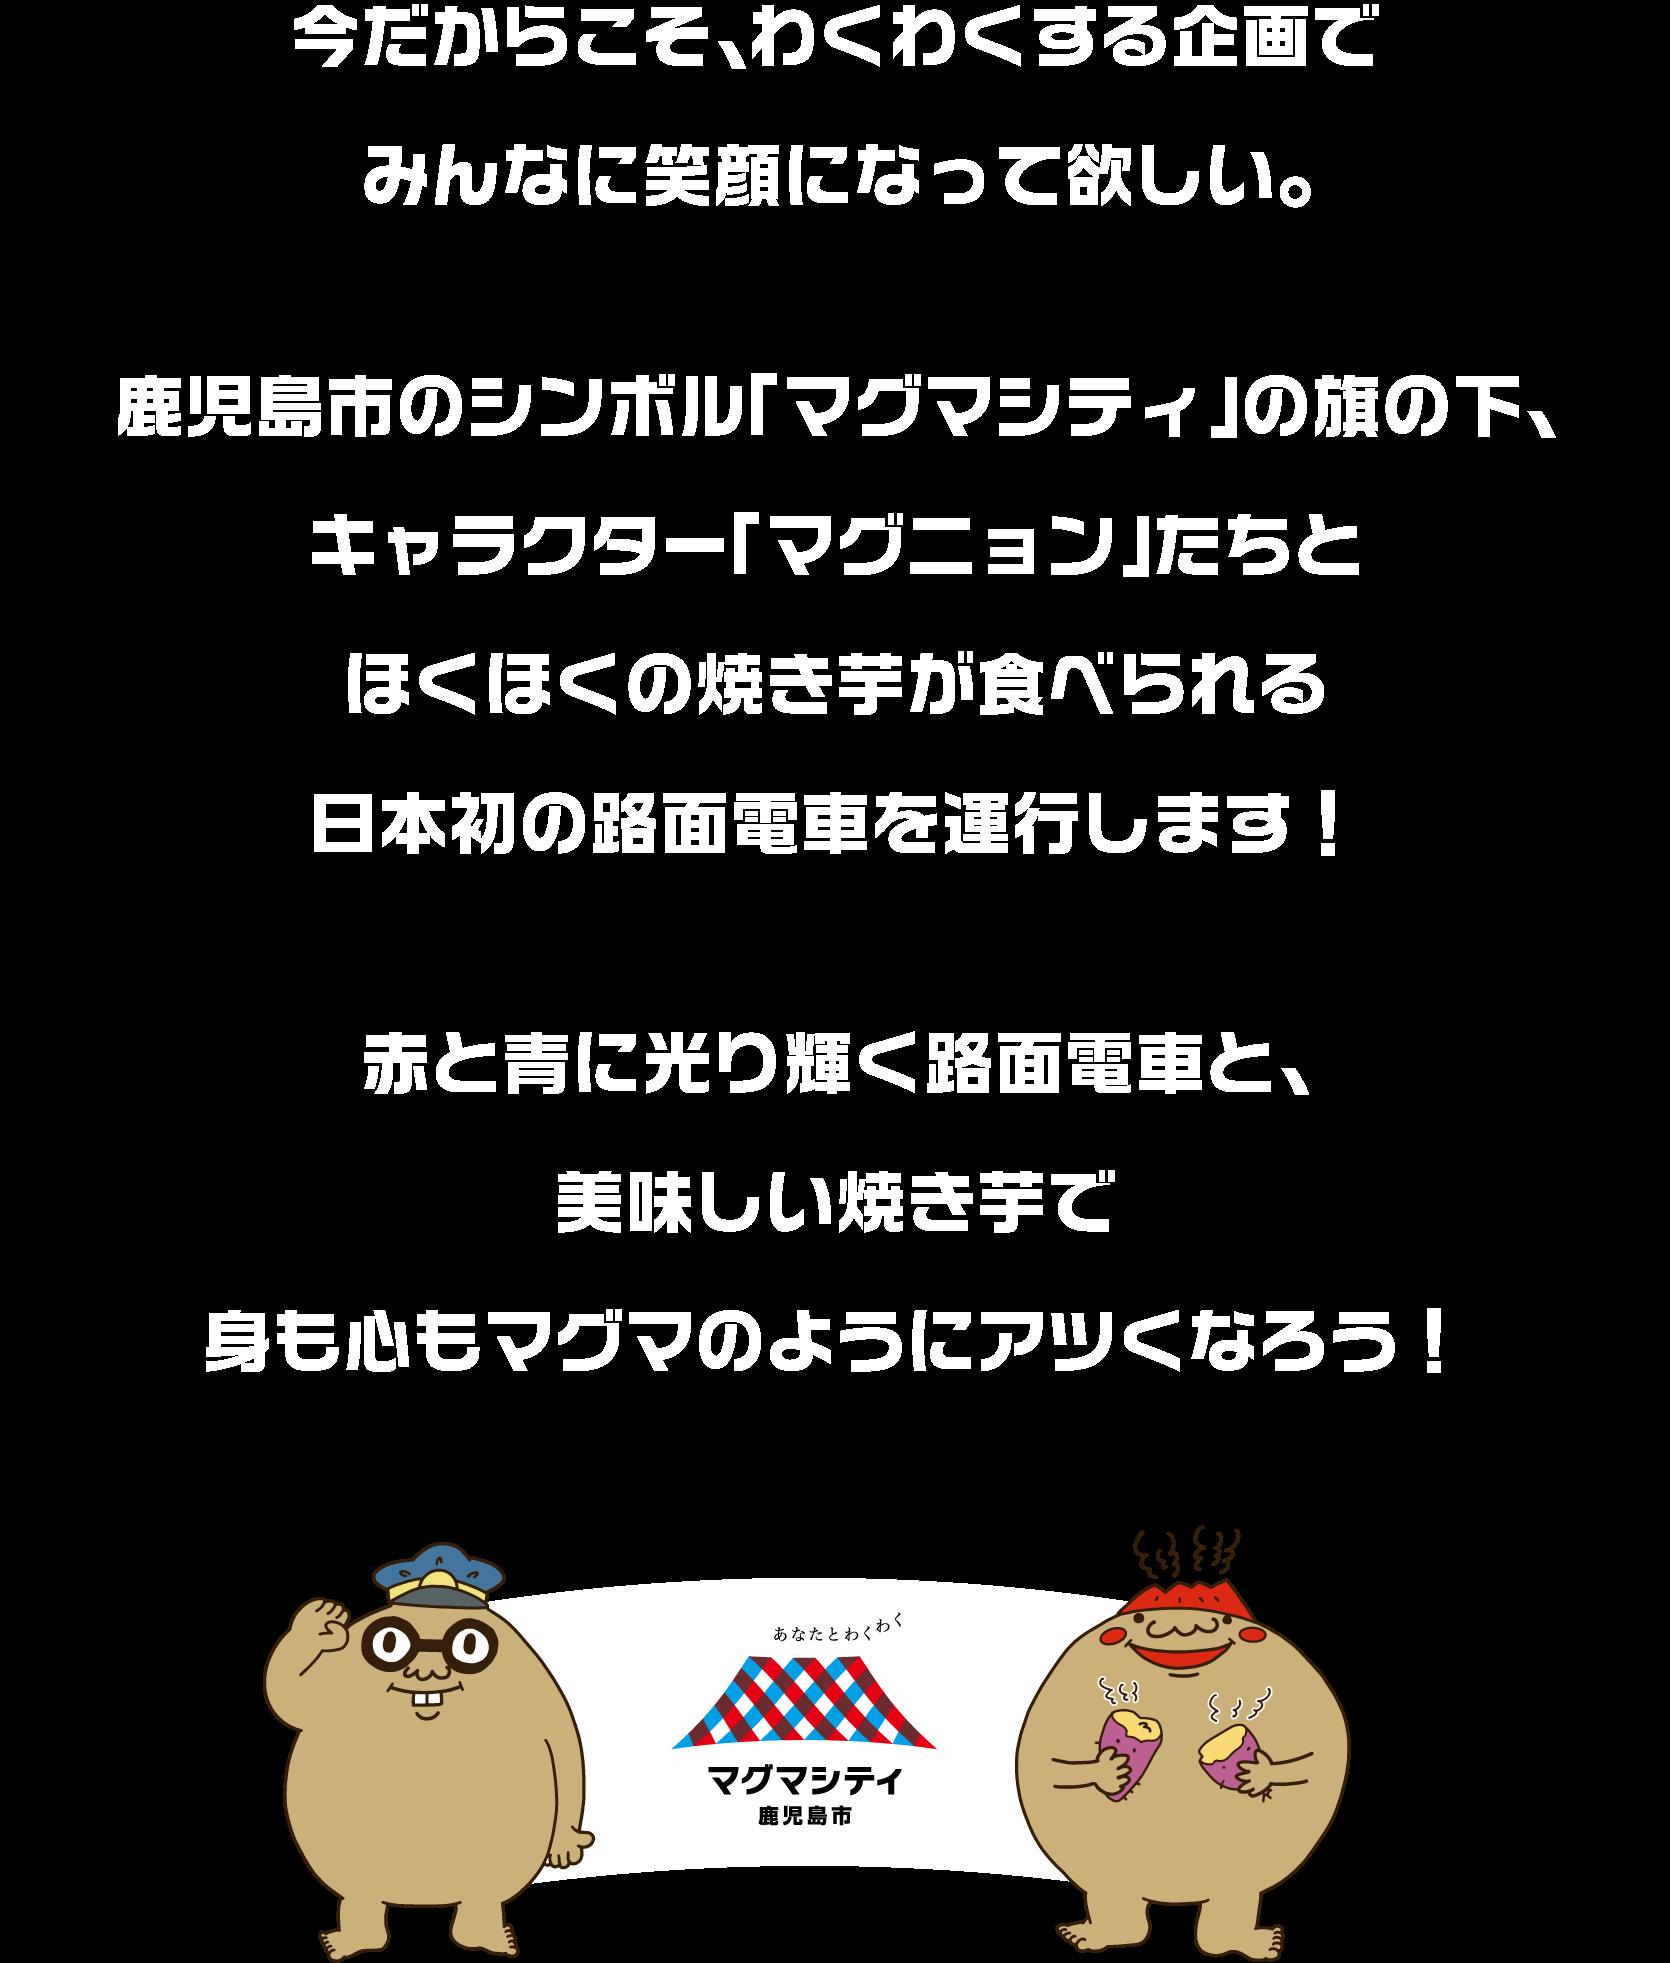 20210103_myd-web-material